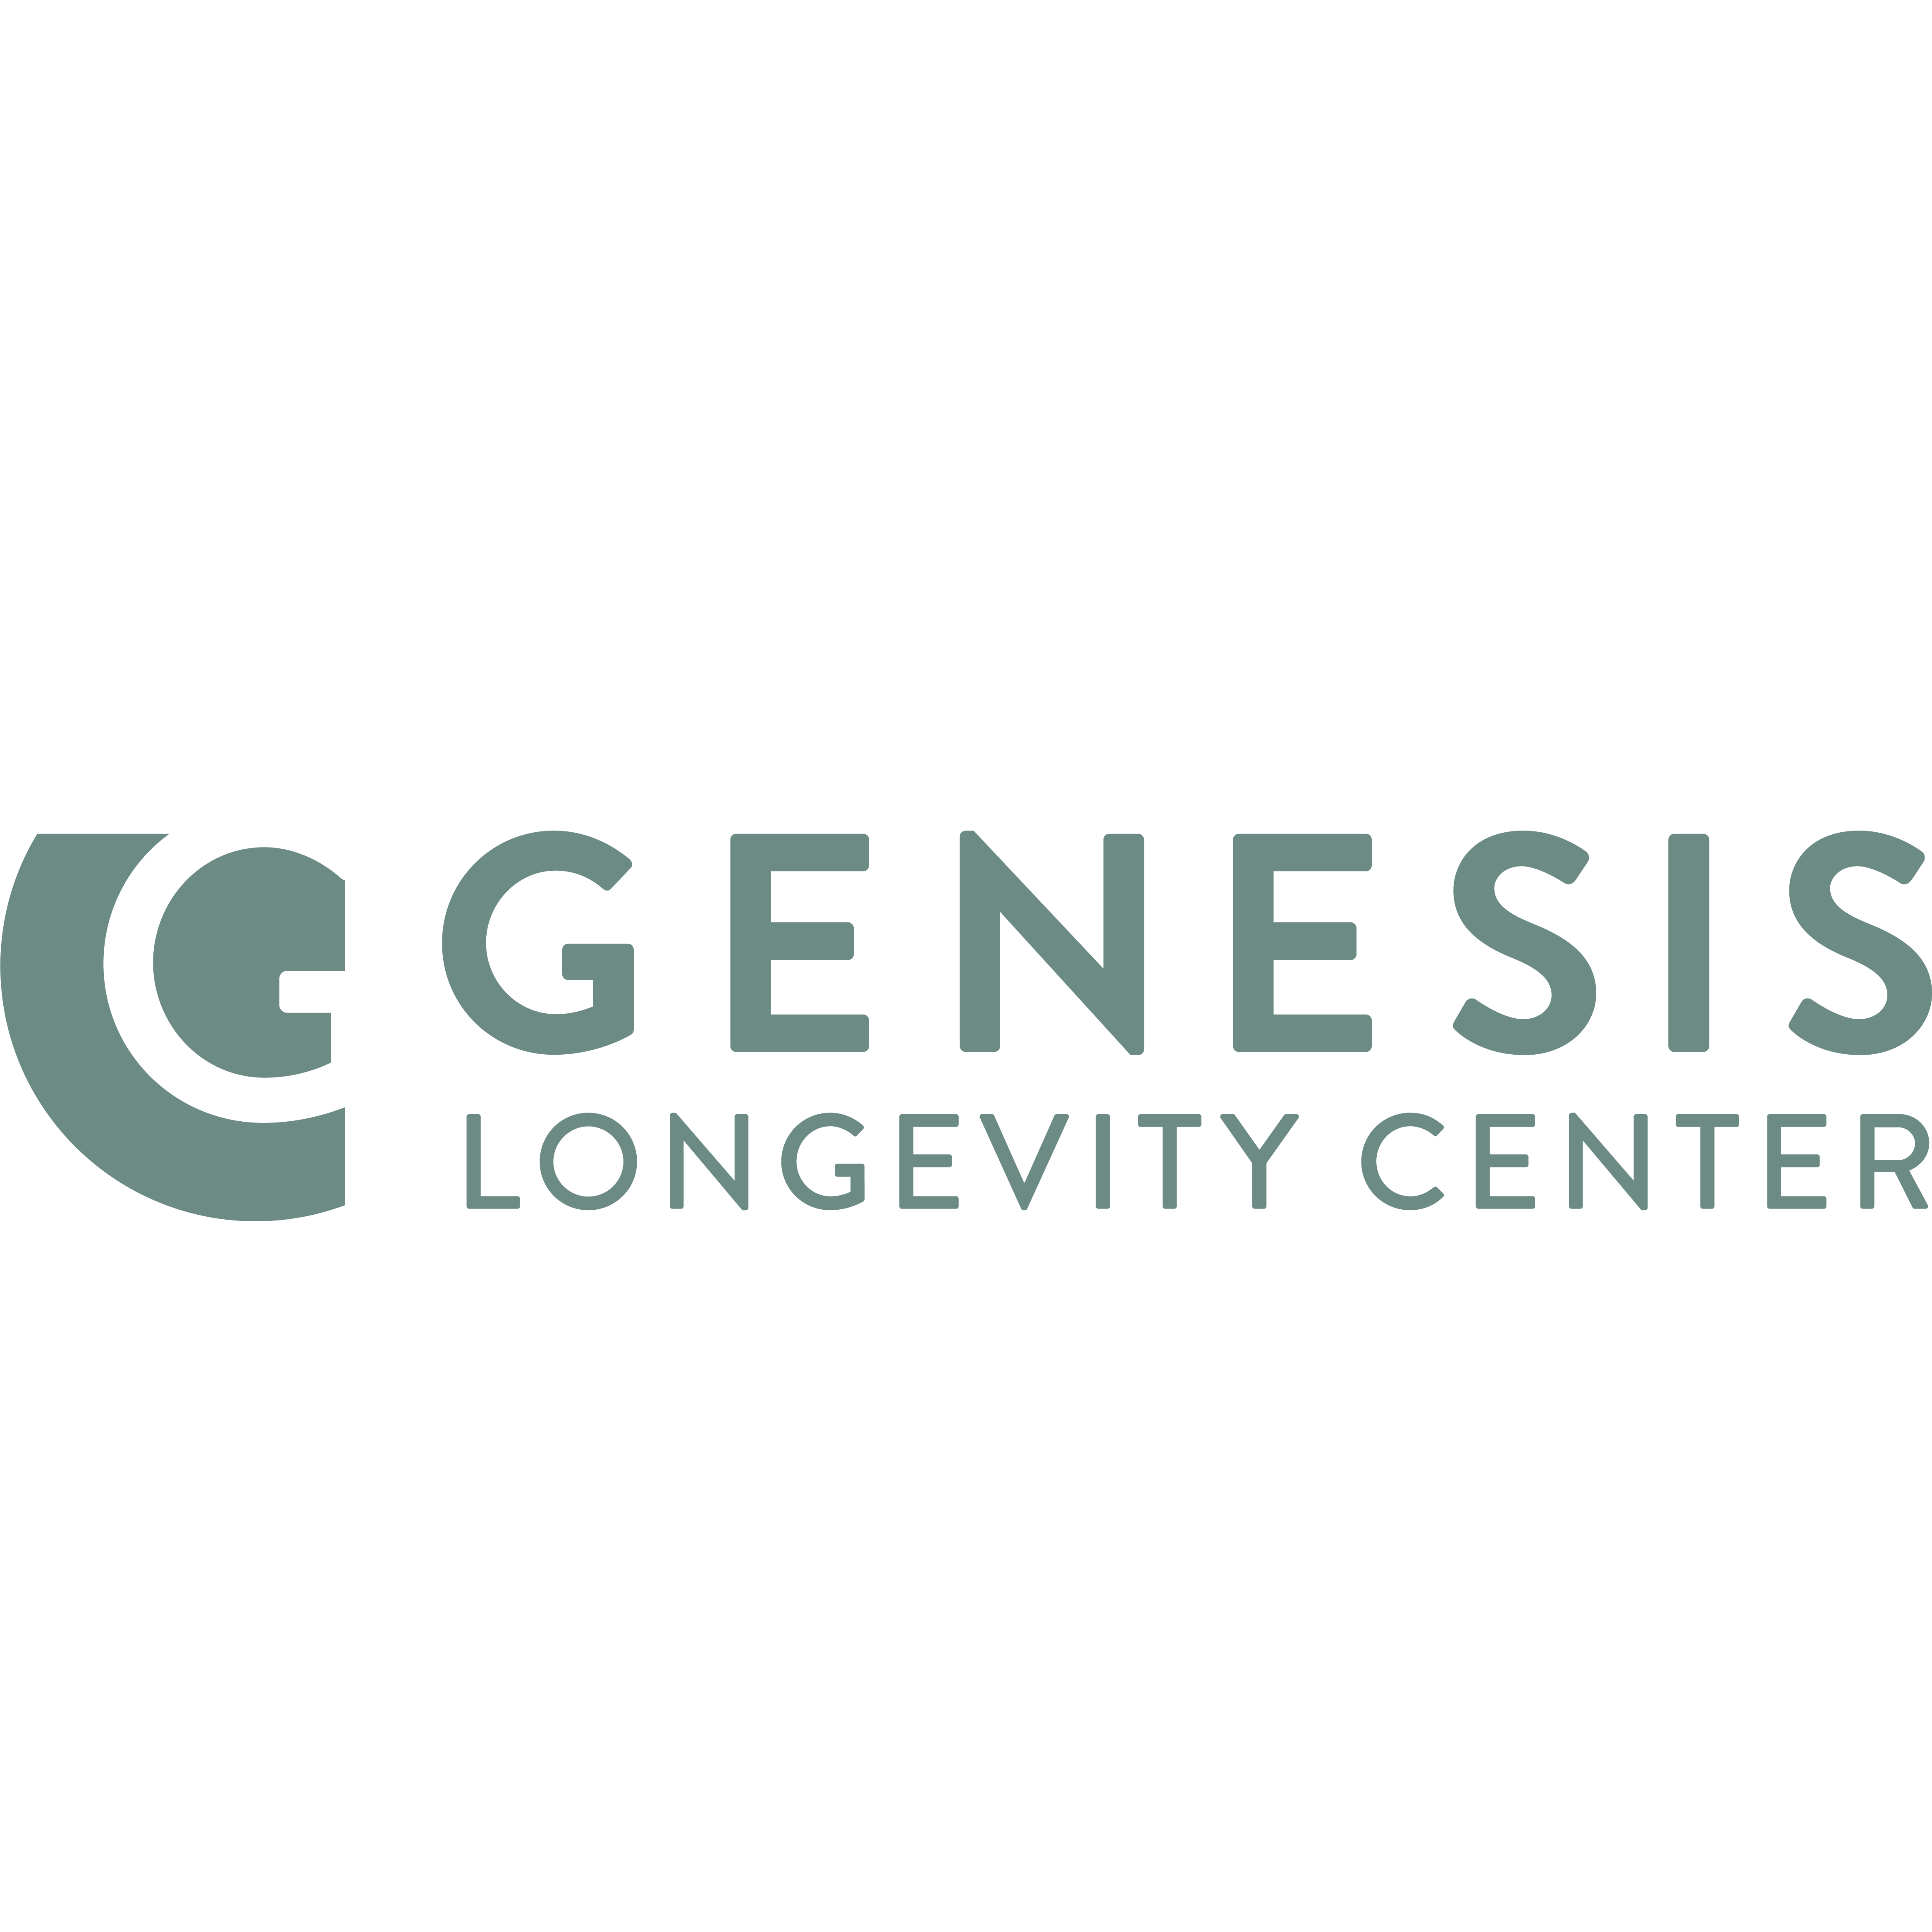 Genesis Longevity Center